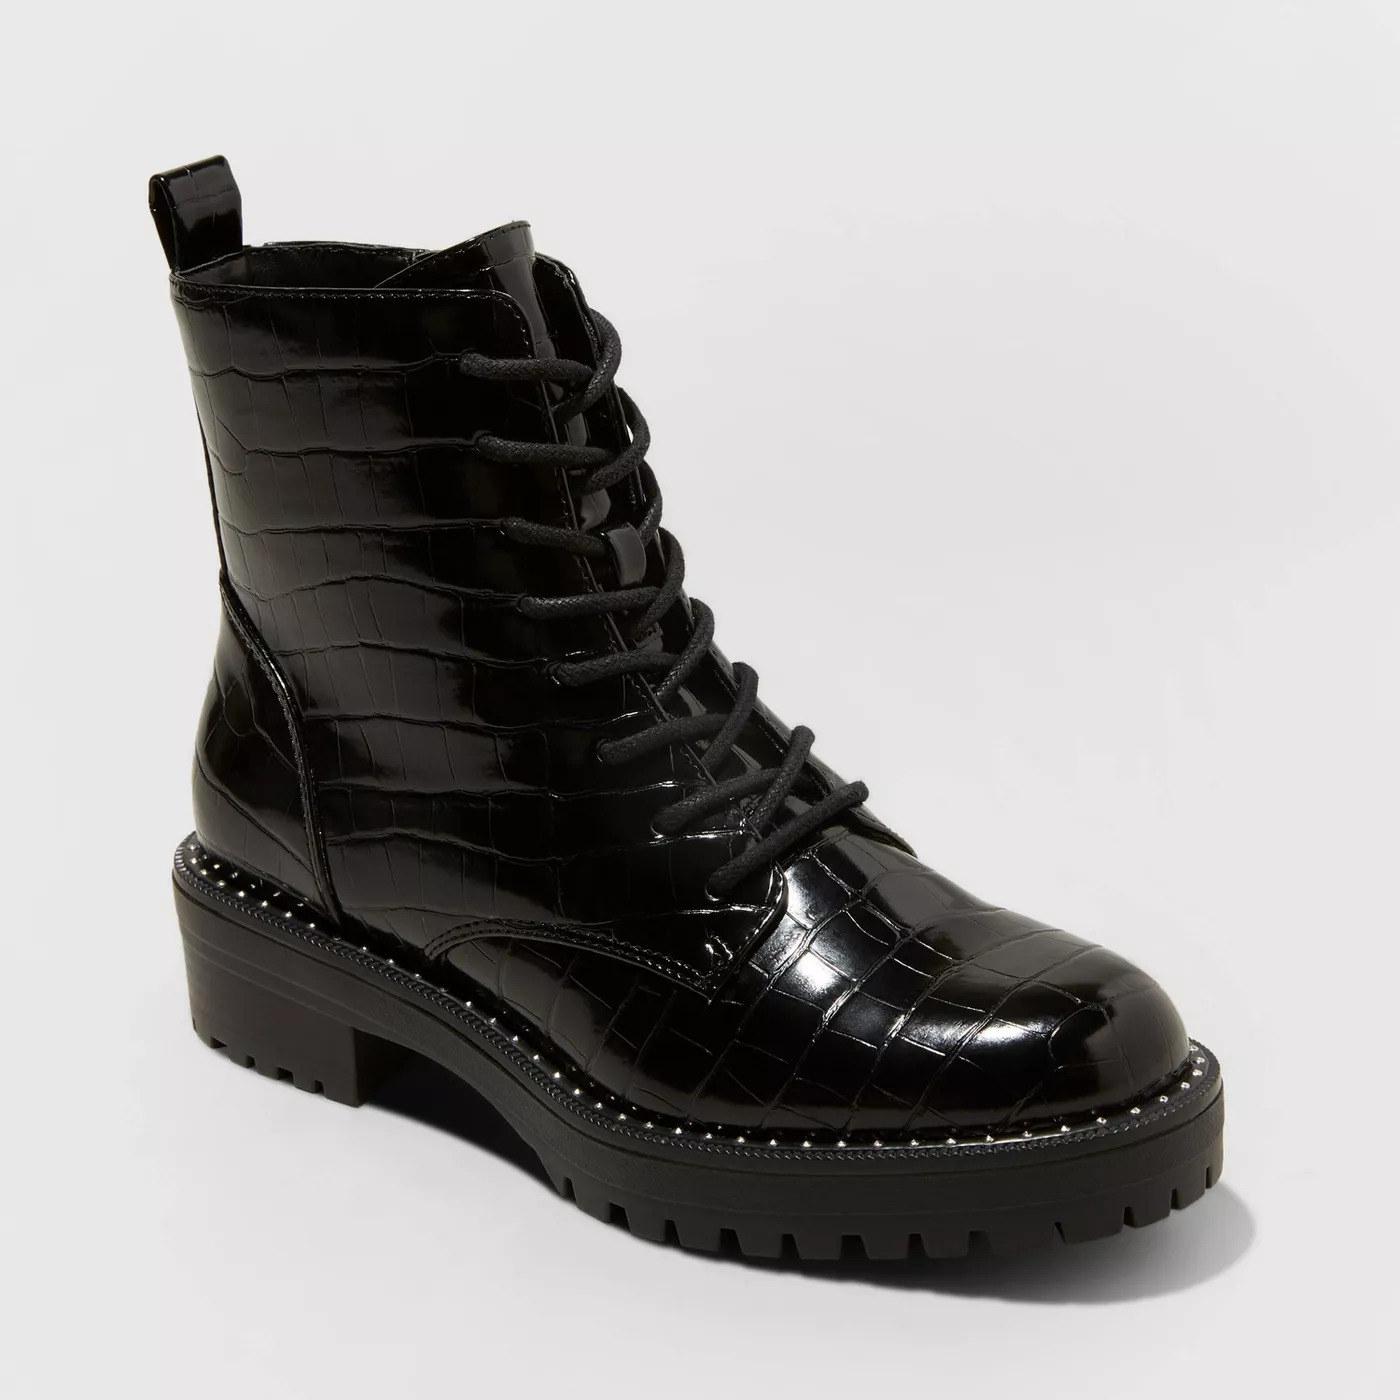 black semi-patent faux crocodile combat boots with laces and black rubber soles